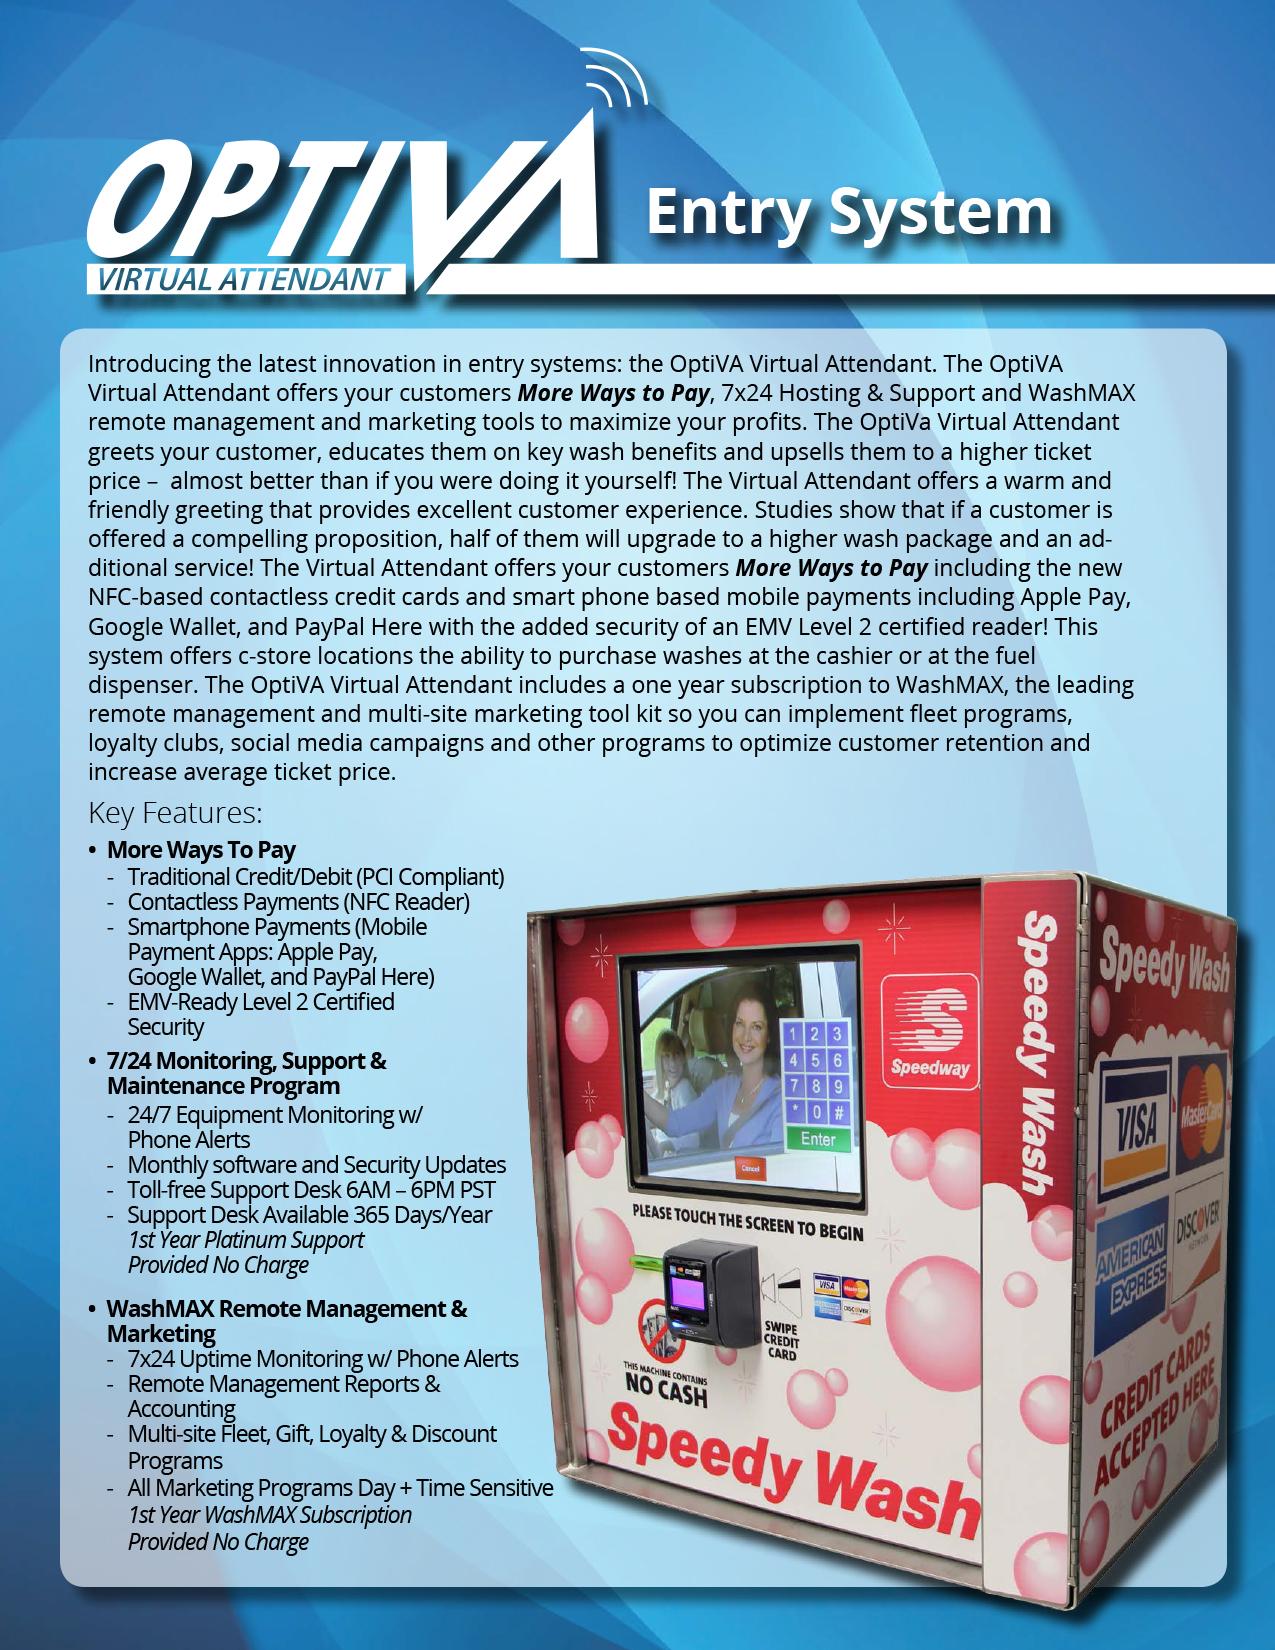 OptivaVirtualAttendantEntrySystem